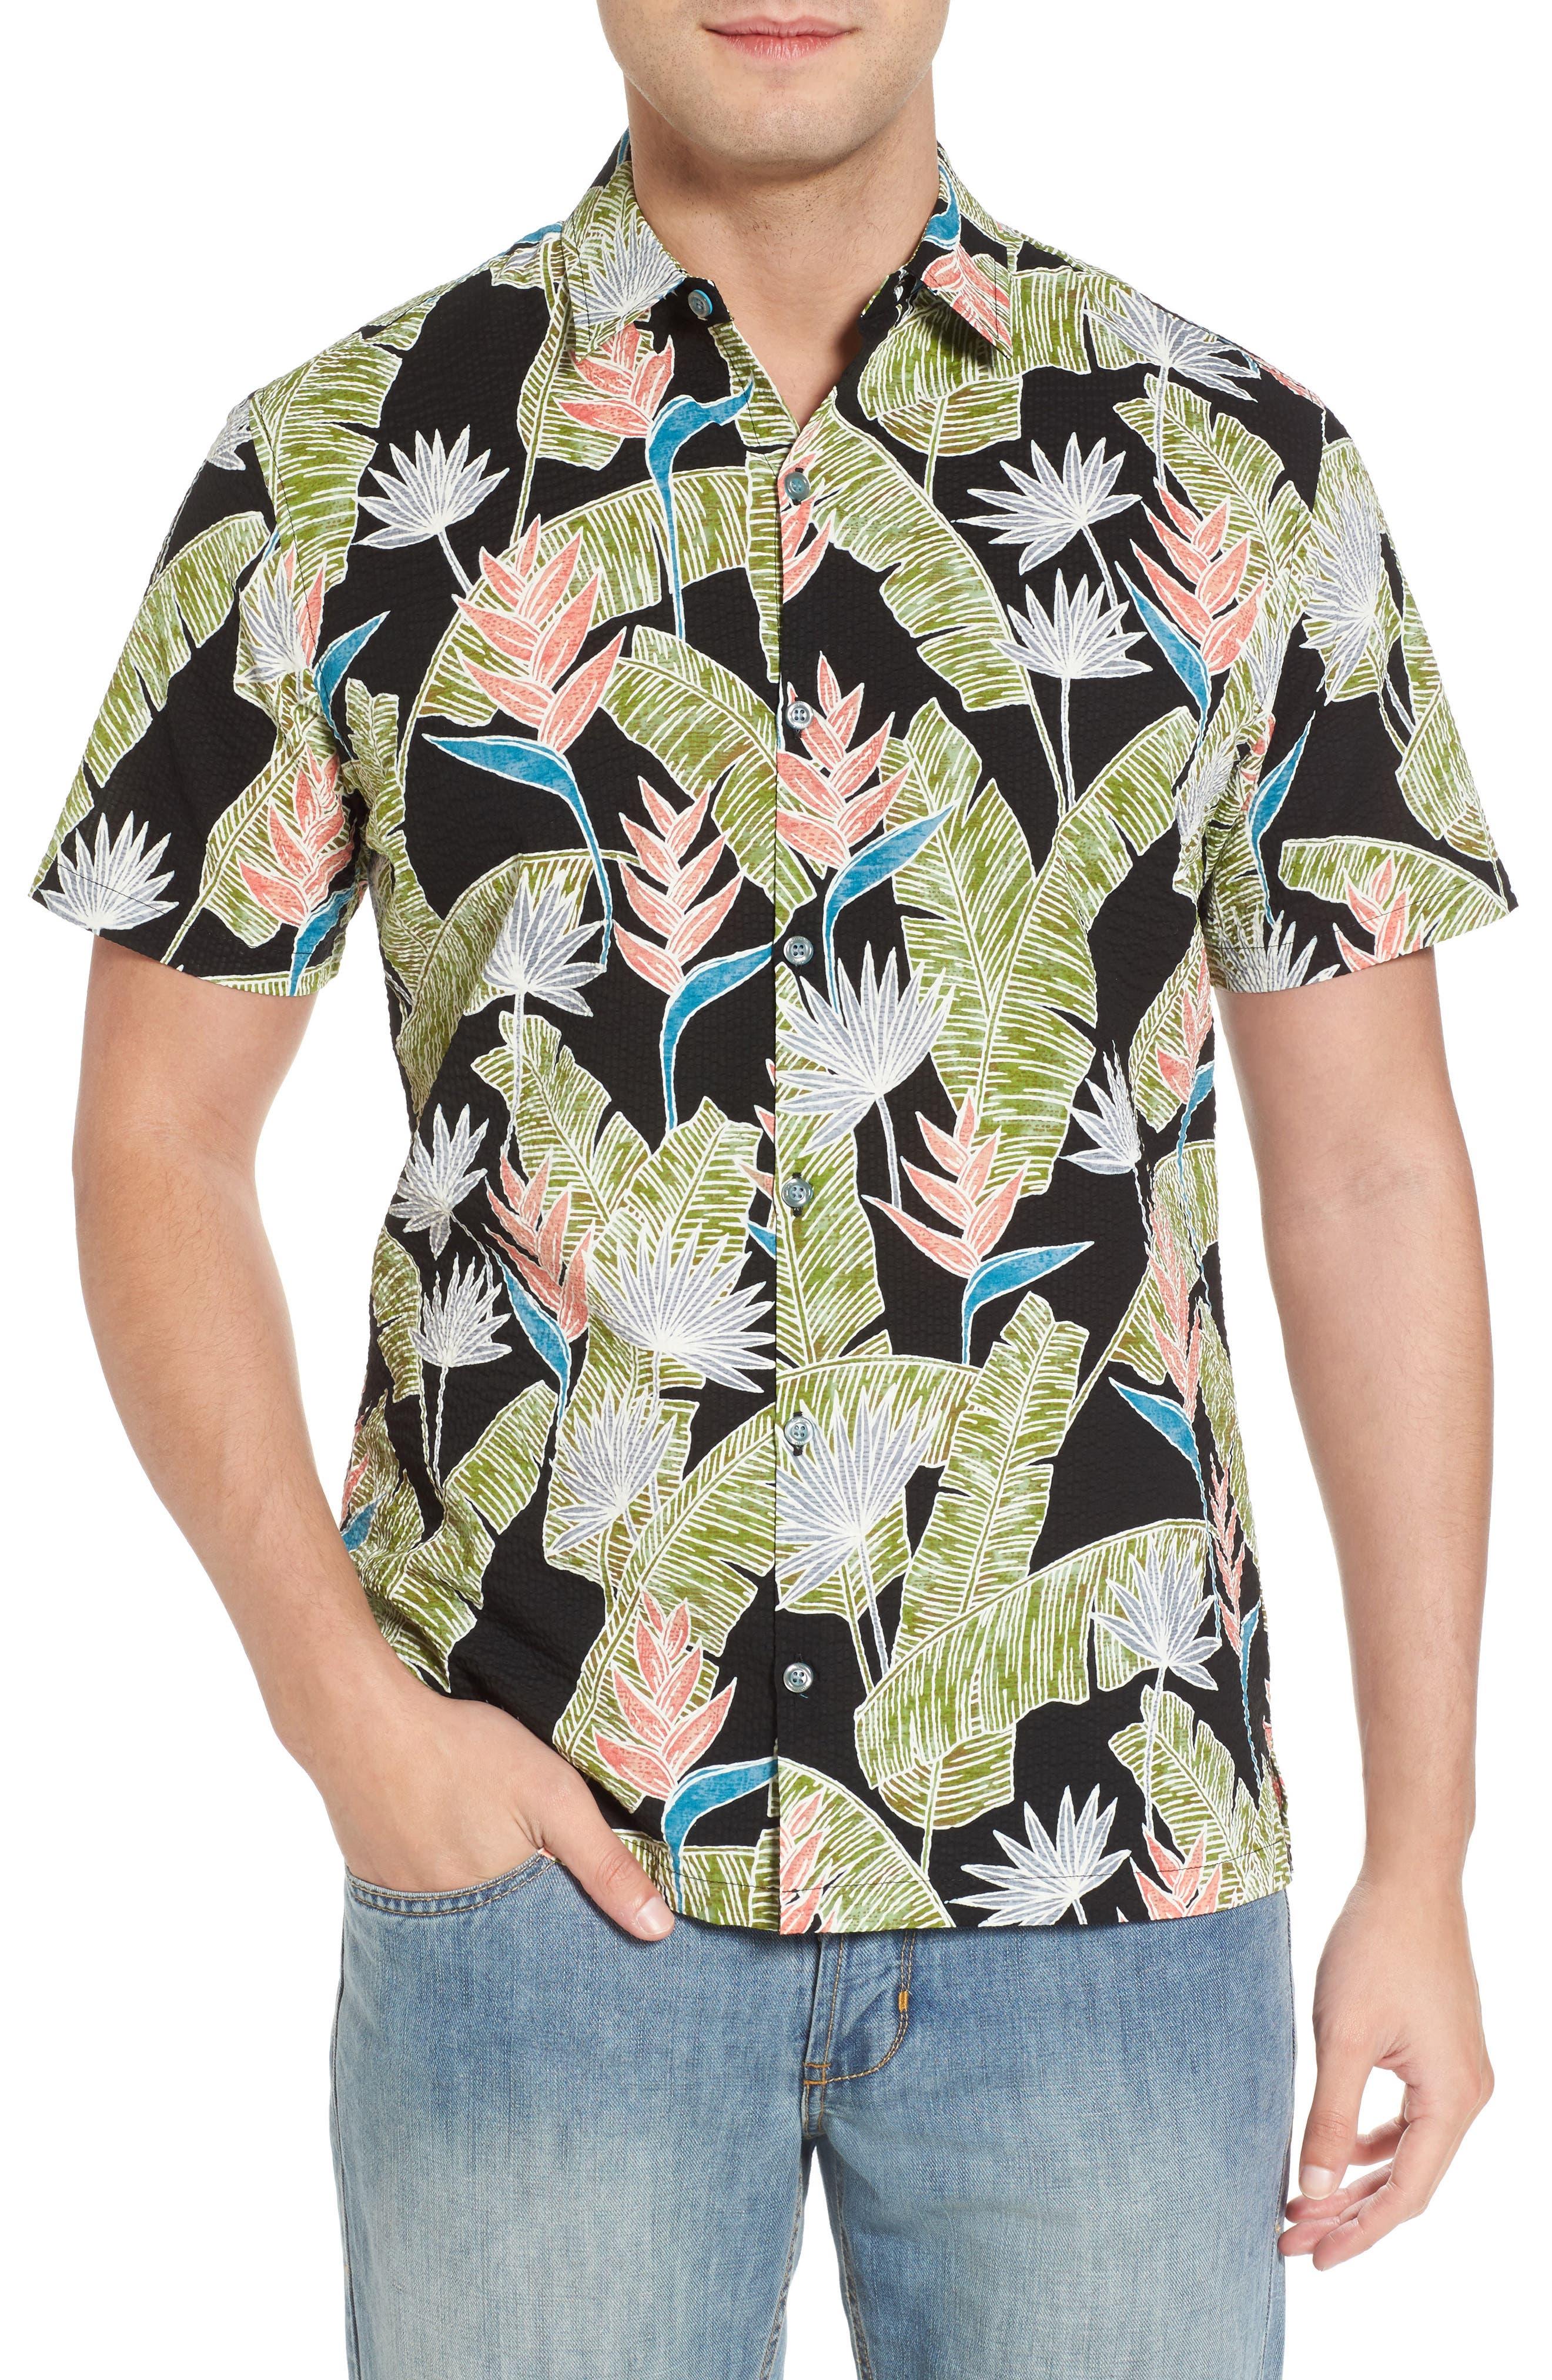 Alternate Image 1 Selected - Tori Richard Sunbird Classic Fit Print Sport Shirt